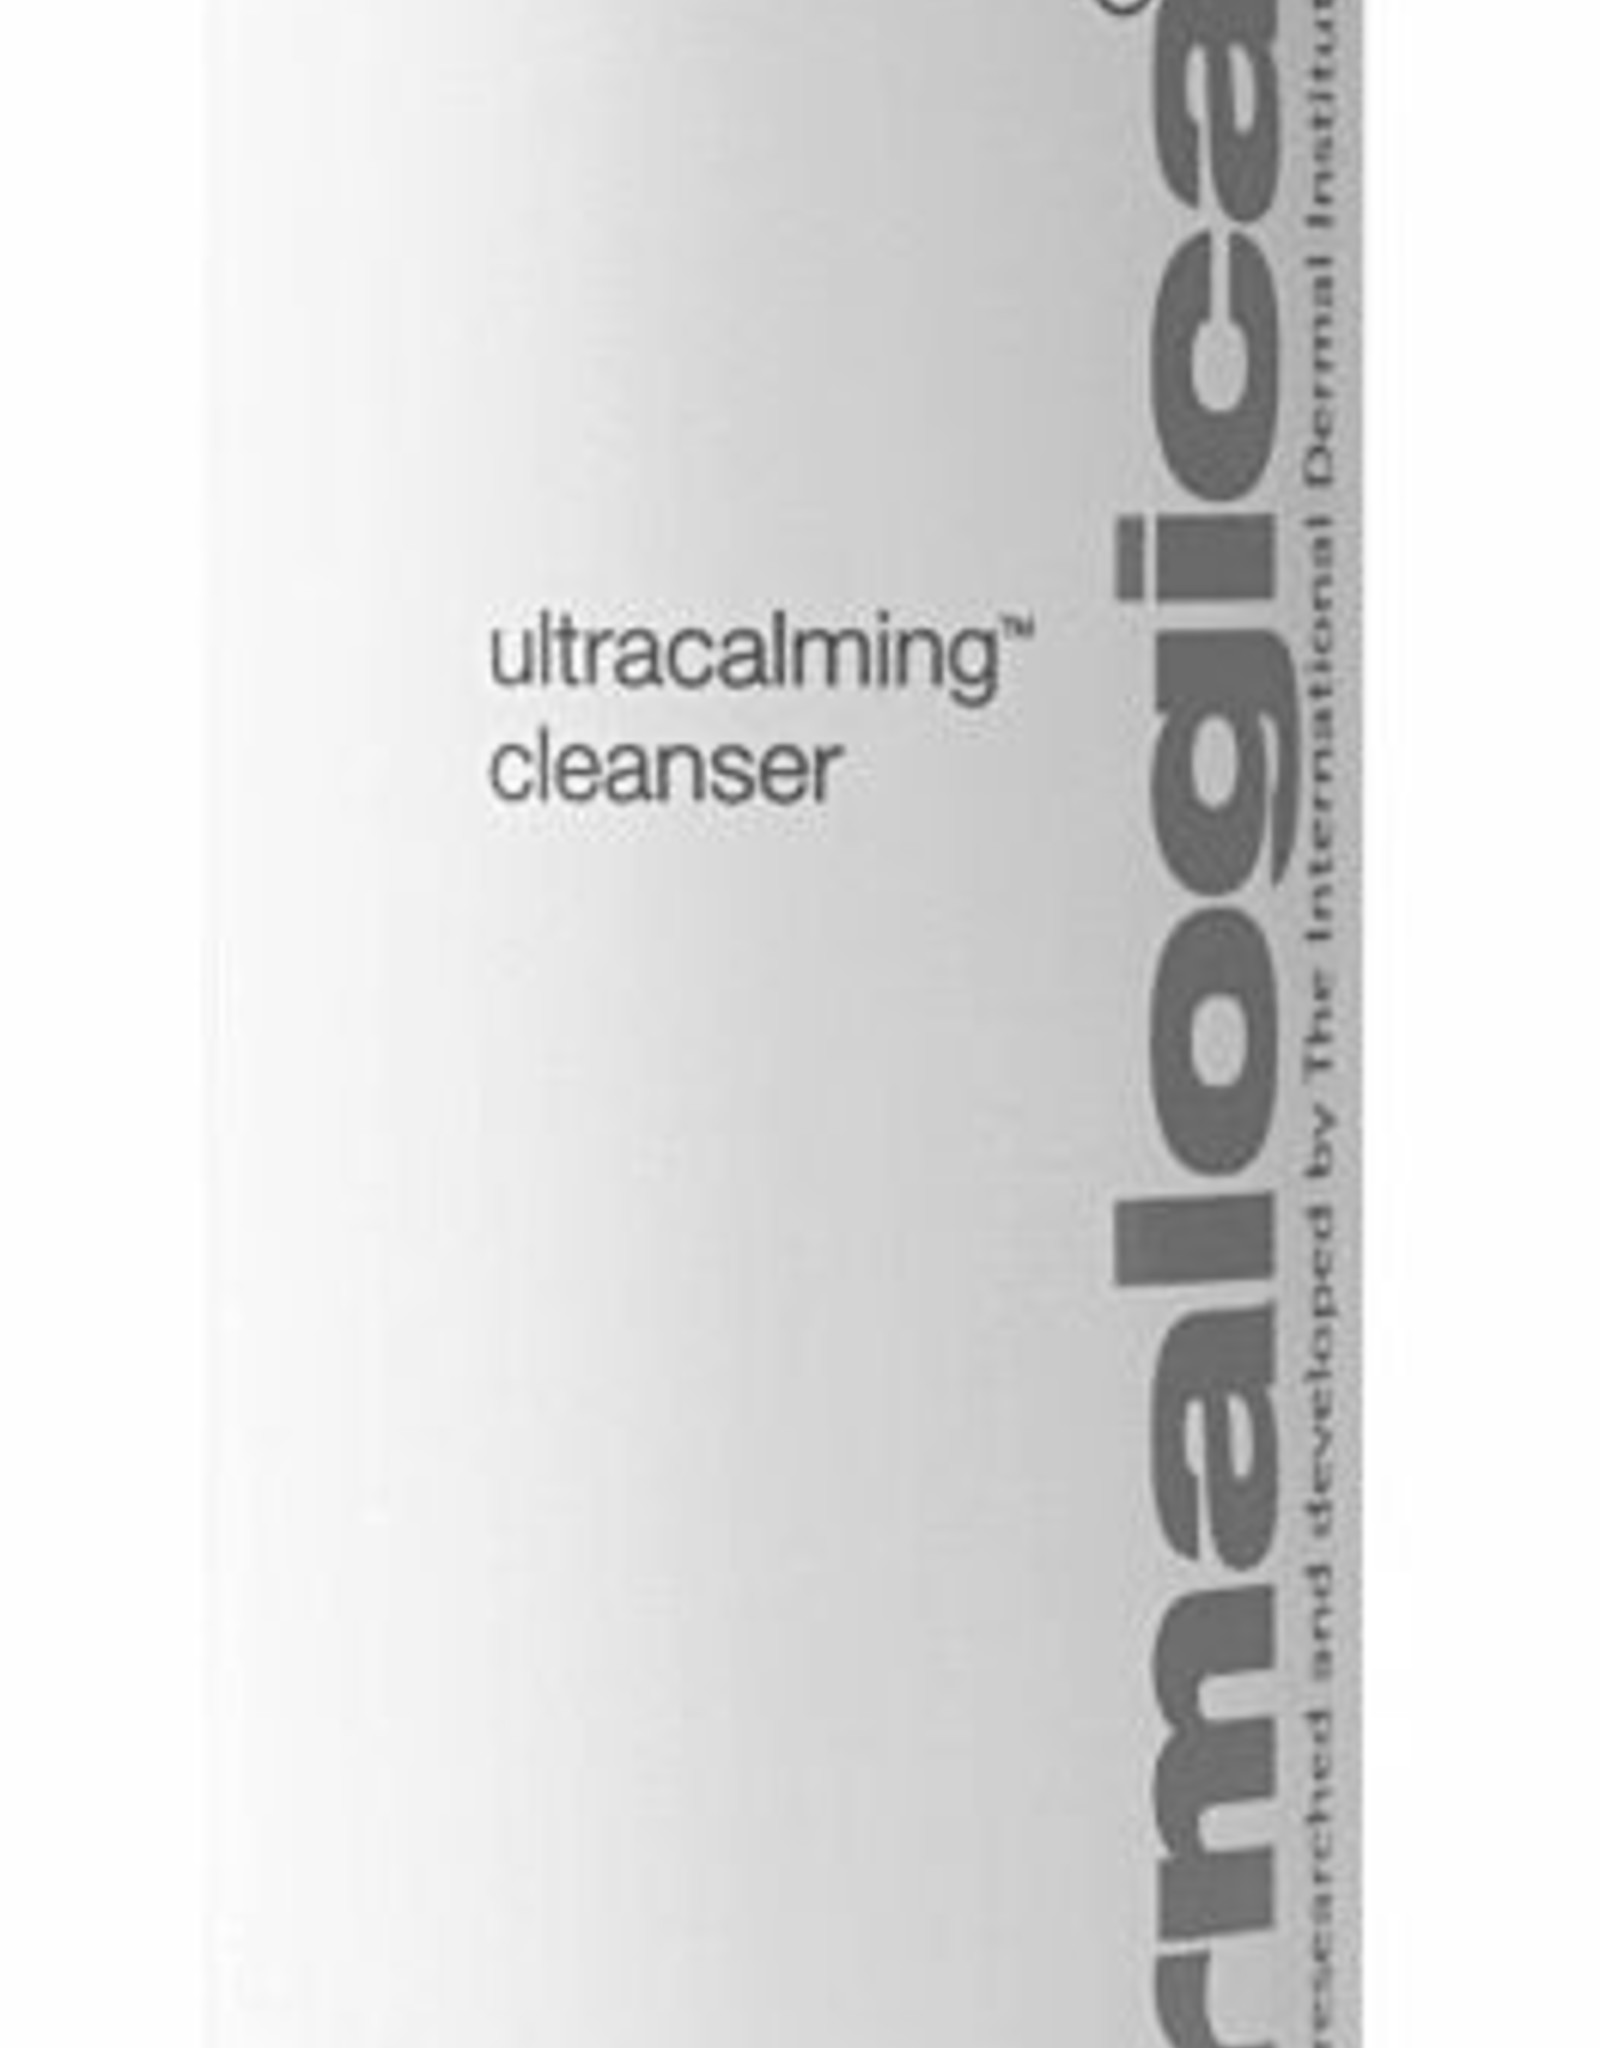 Dermalogica UltraCalming - Cleanser 250ml - Dermalogica